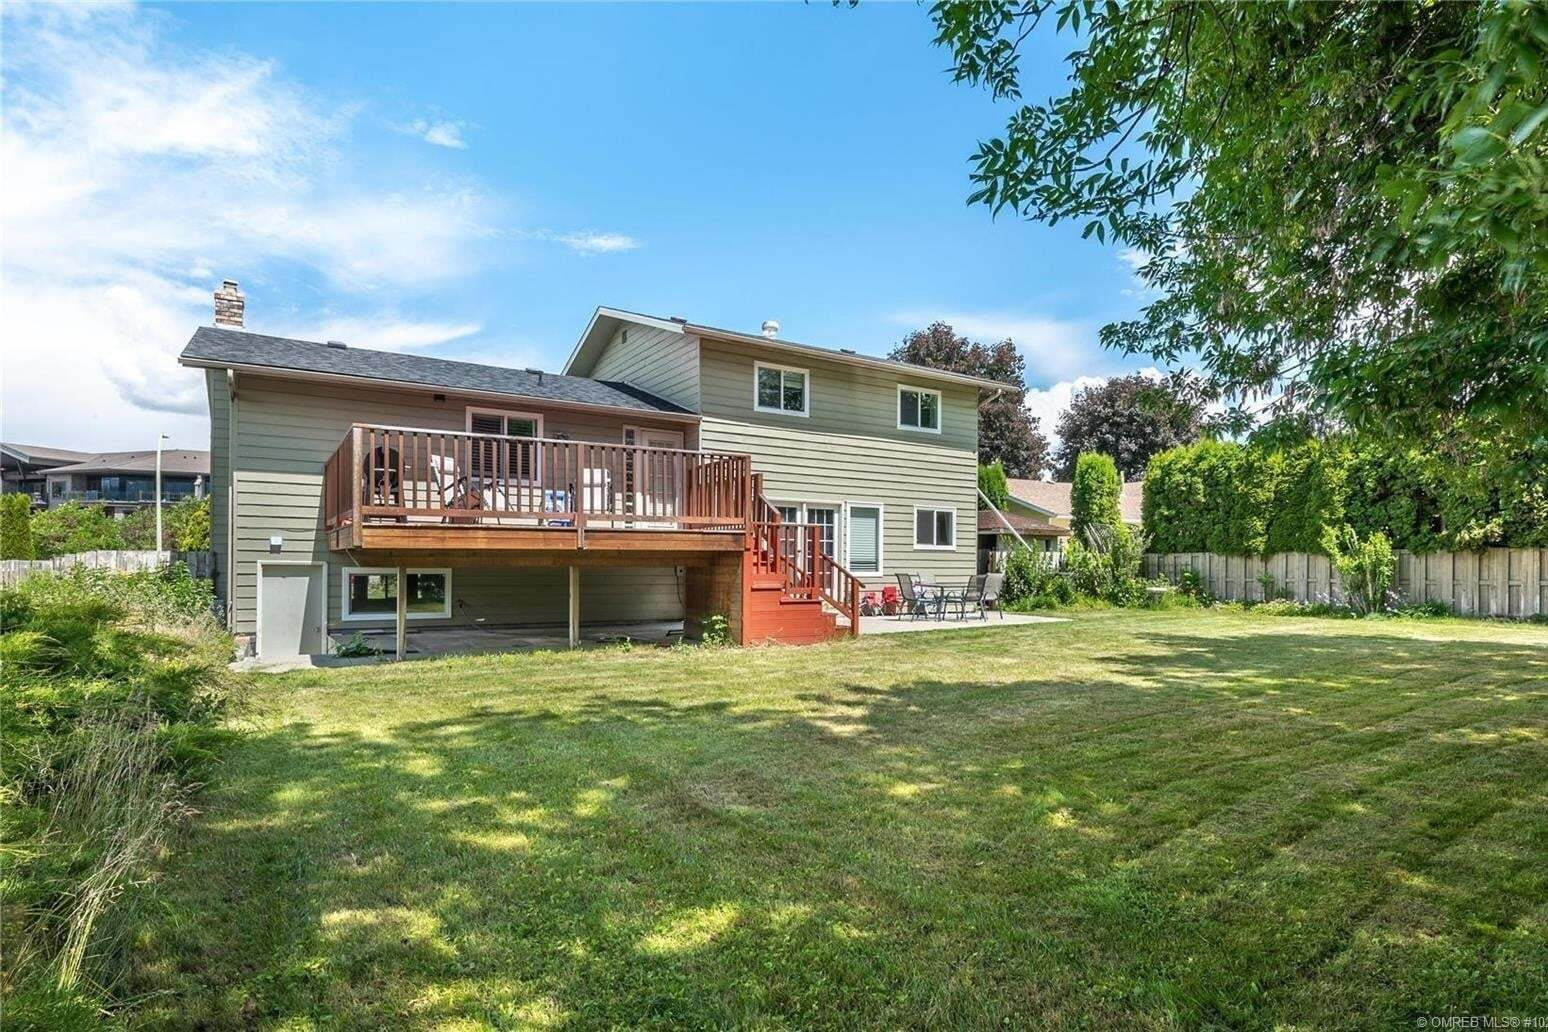 House for sale at 565 Sarsons Rd Kelowna British Columbia - MLS: 10212561